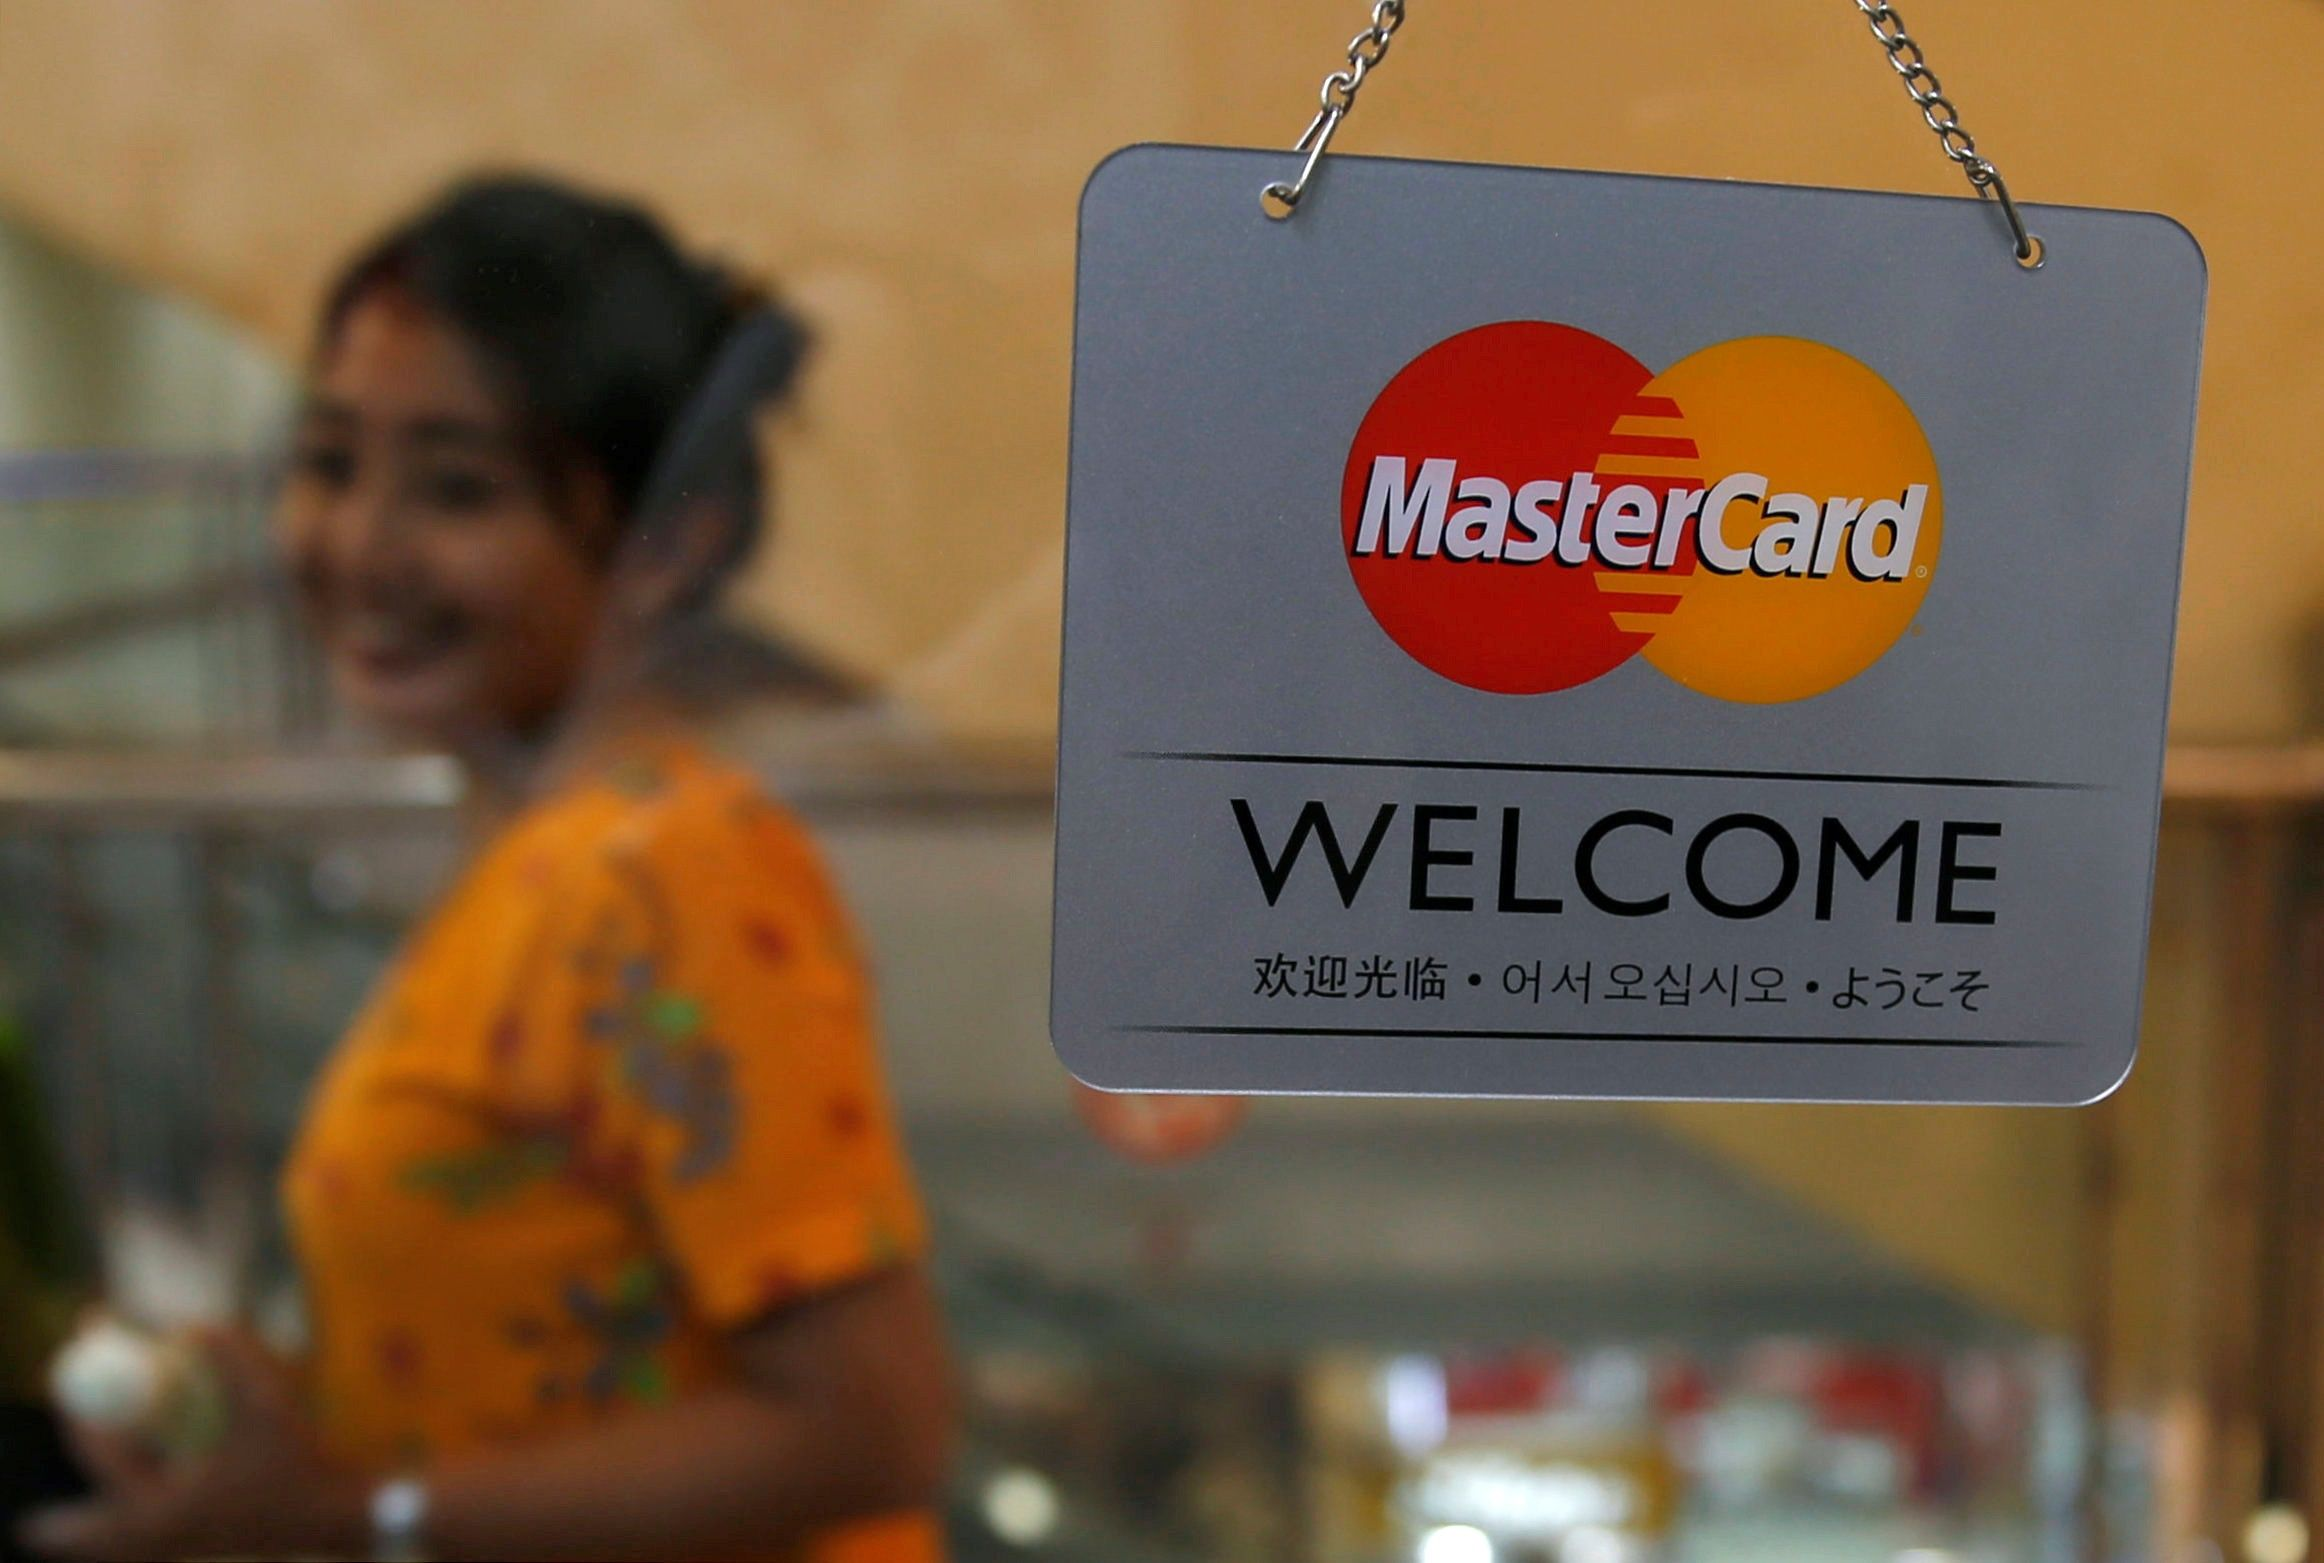 mastercard selfie pay identity check